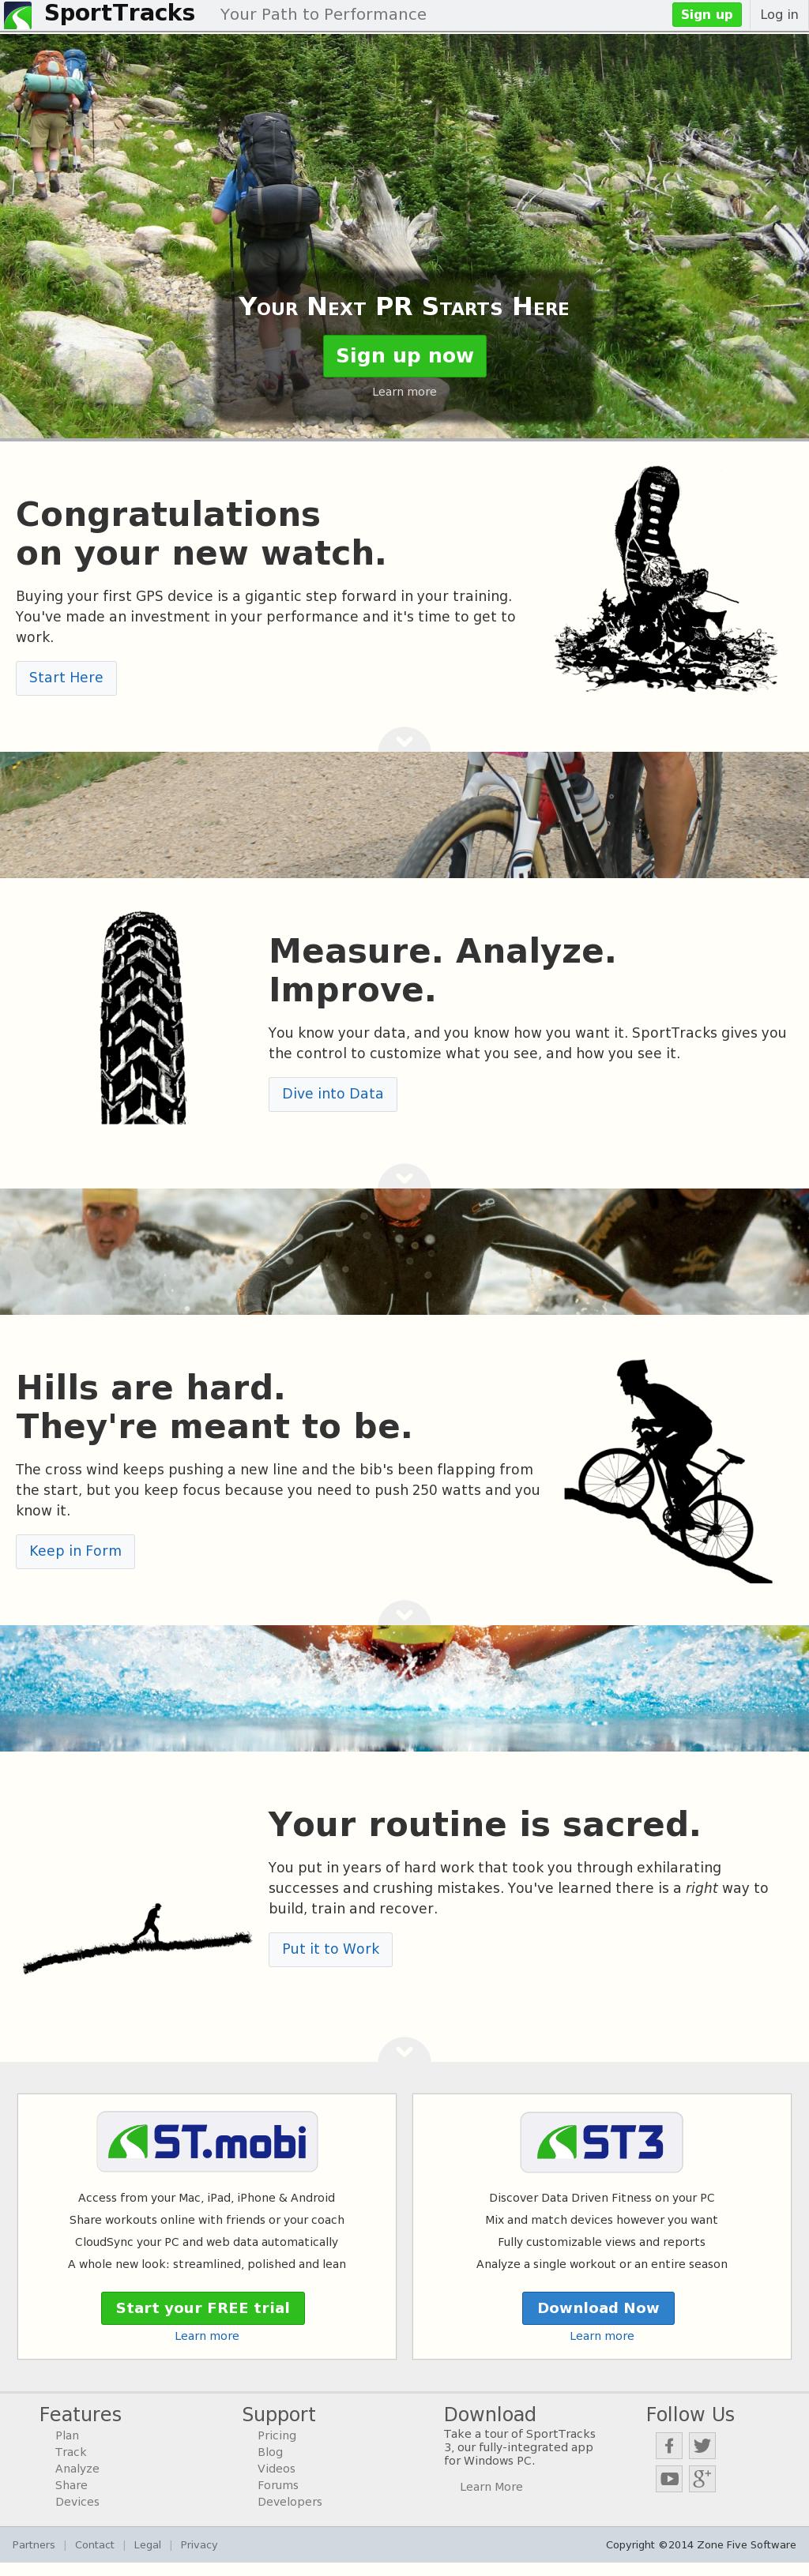 Owler Reports - SportTracks Blog Tracking HRV with Garmin